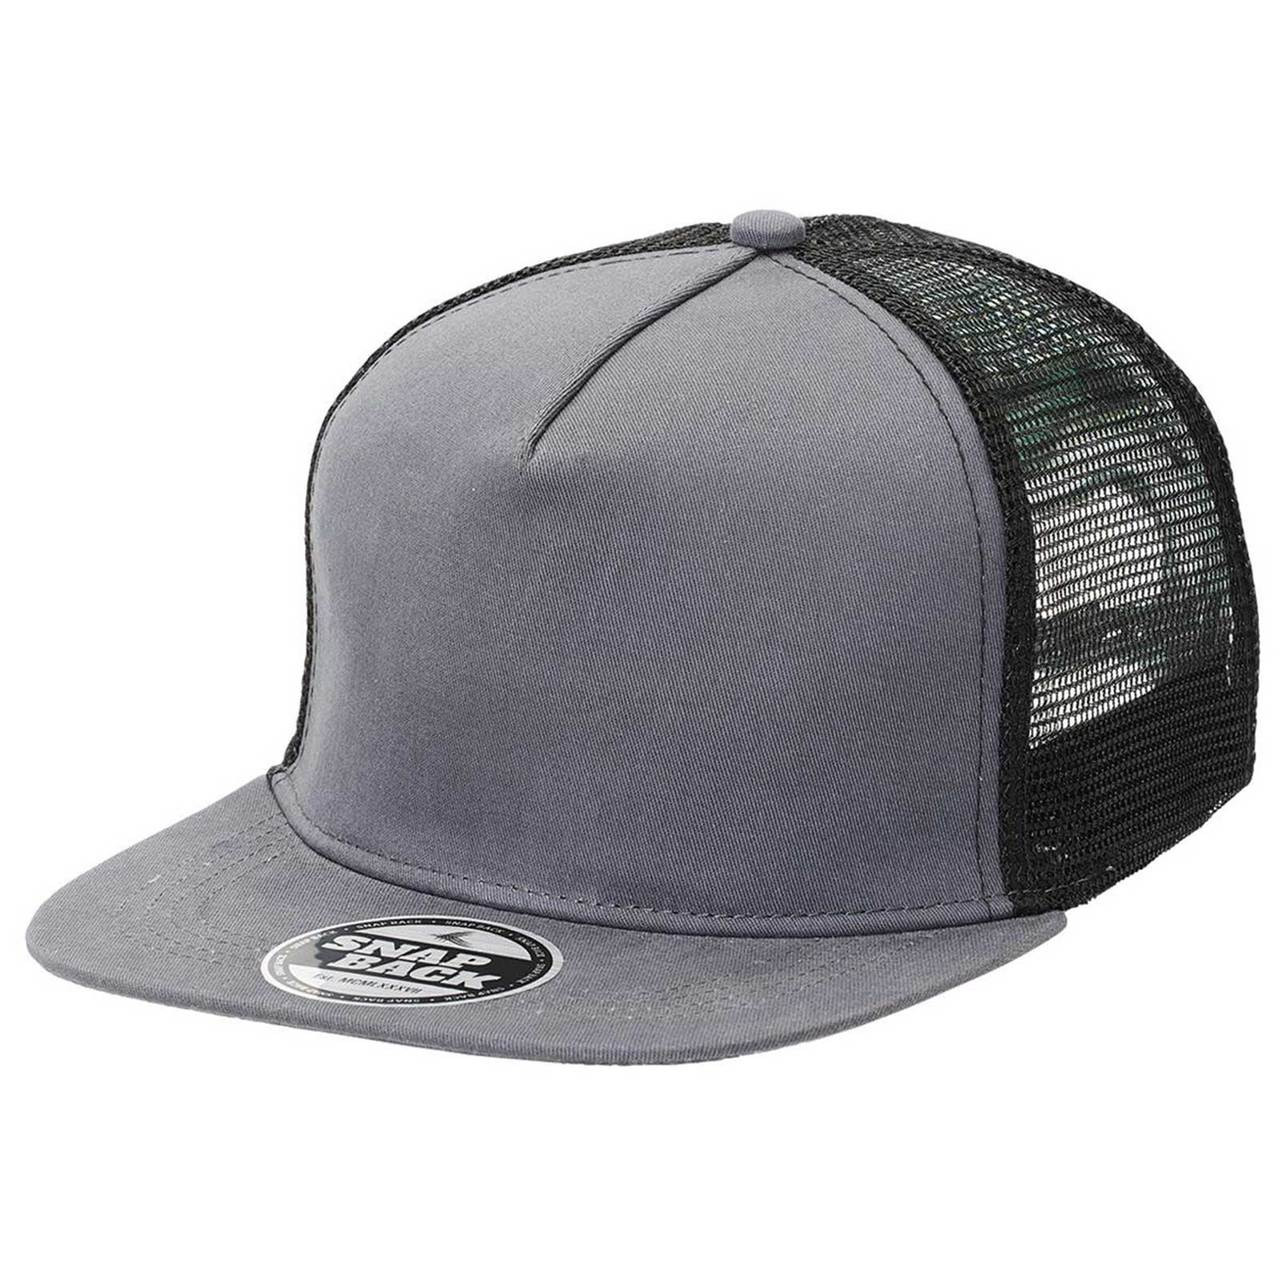 a8c58c02161 Buy Wholesale Plain Chino Snapback Trucker Caps Online . Bulk Blank Apparel